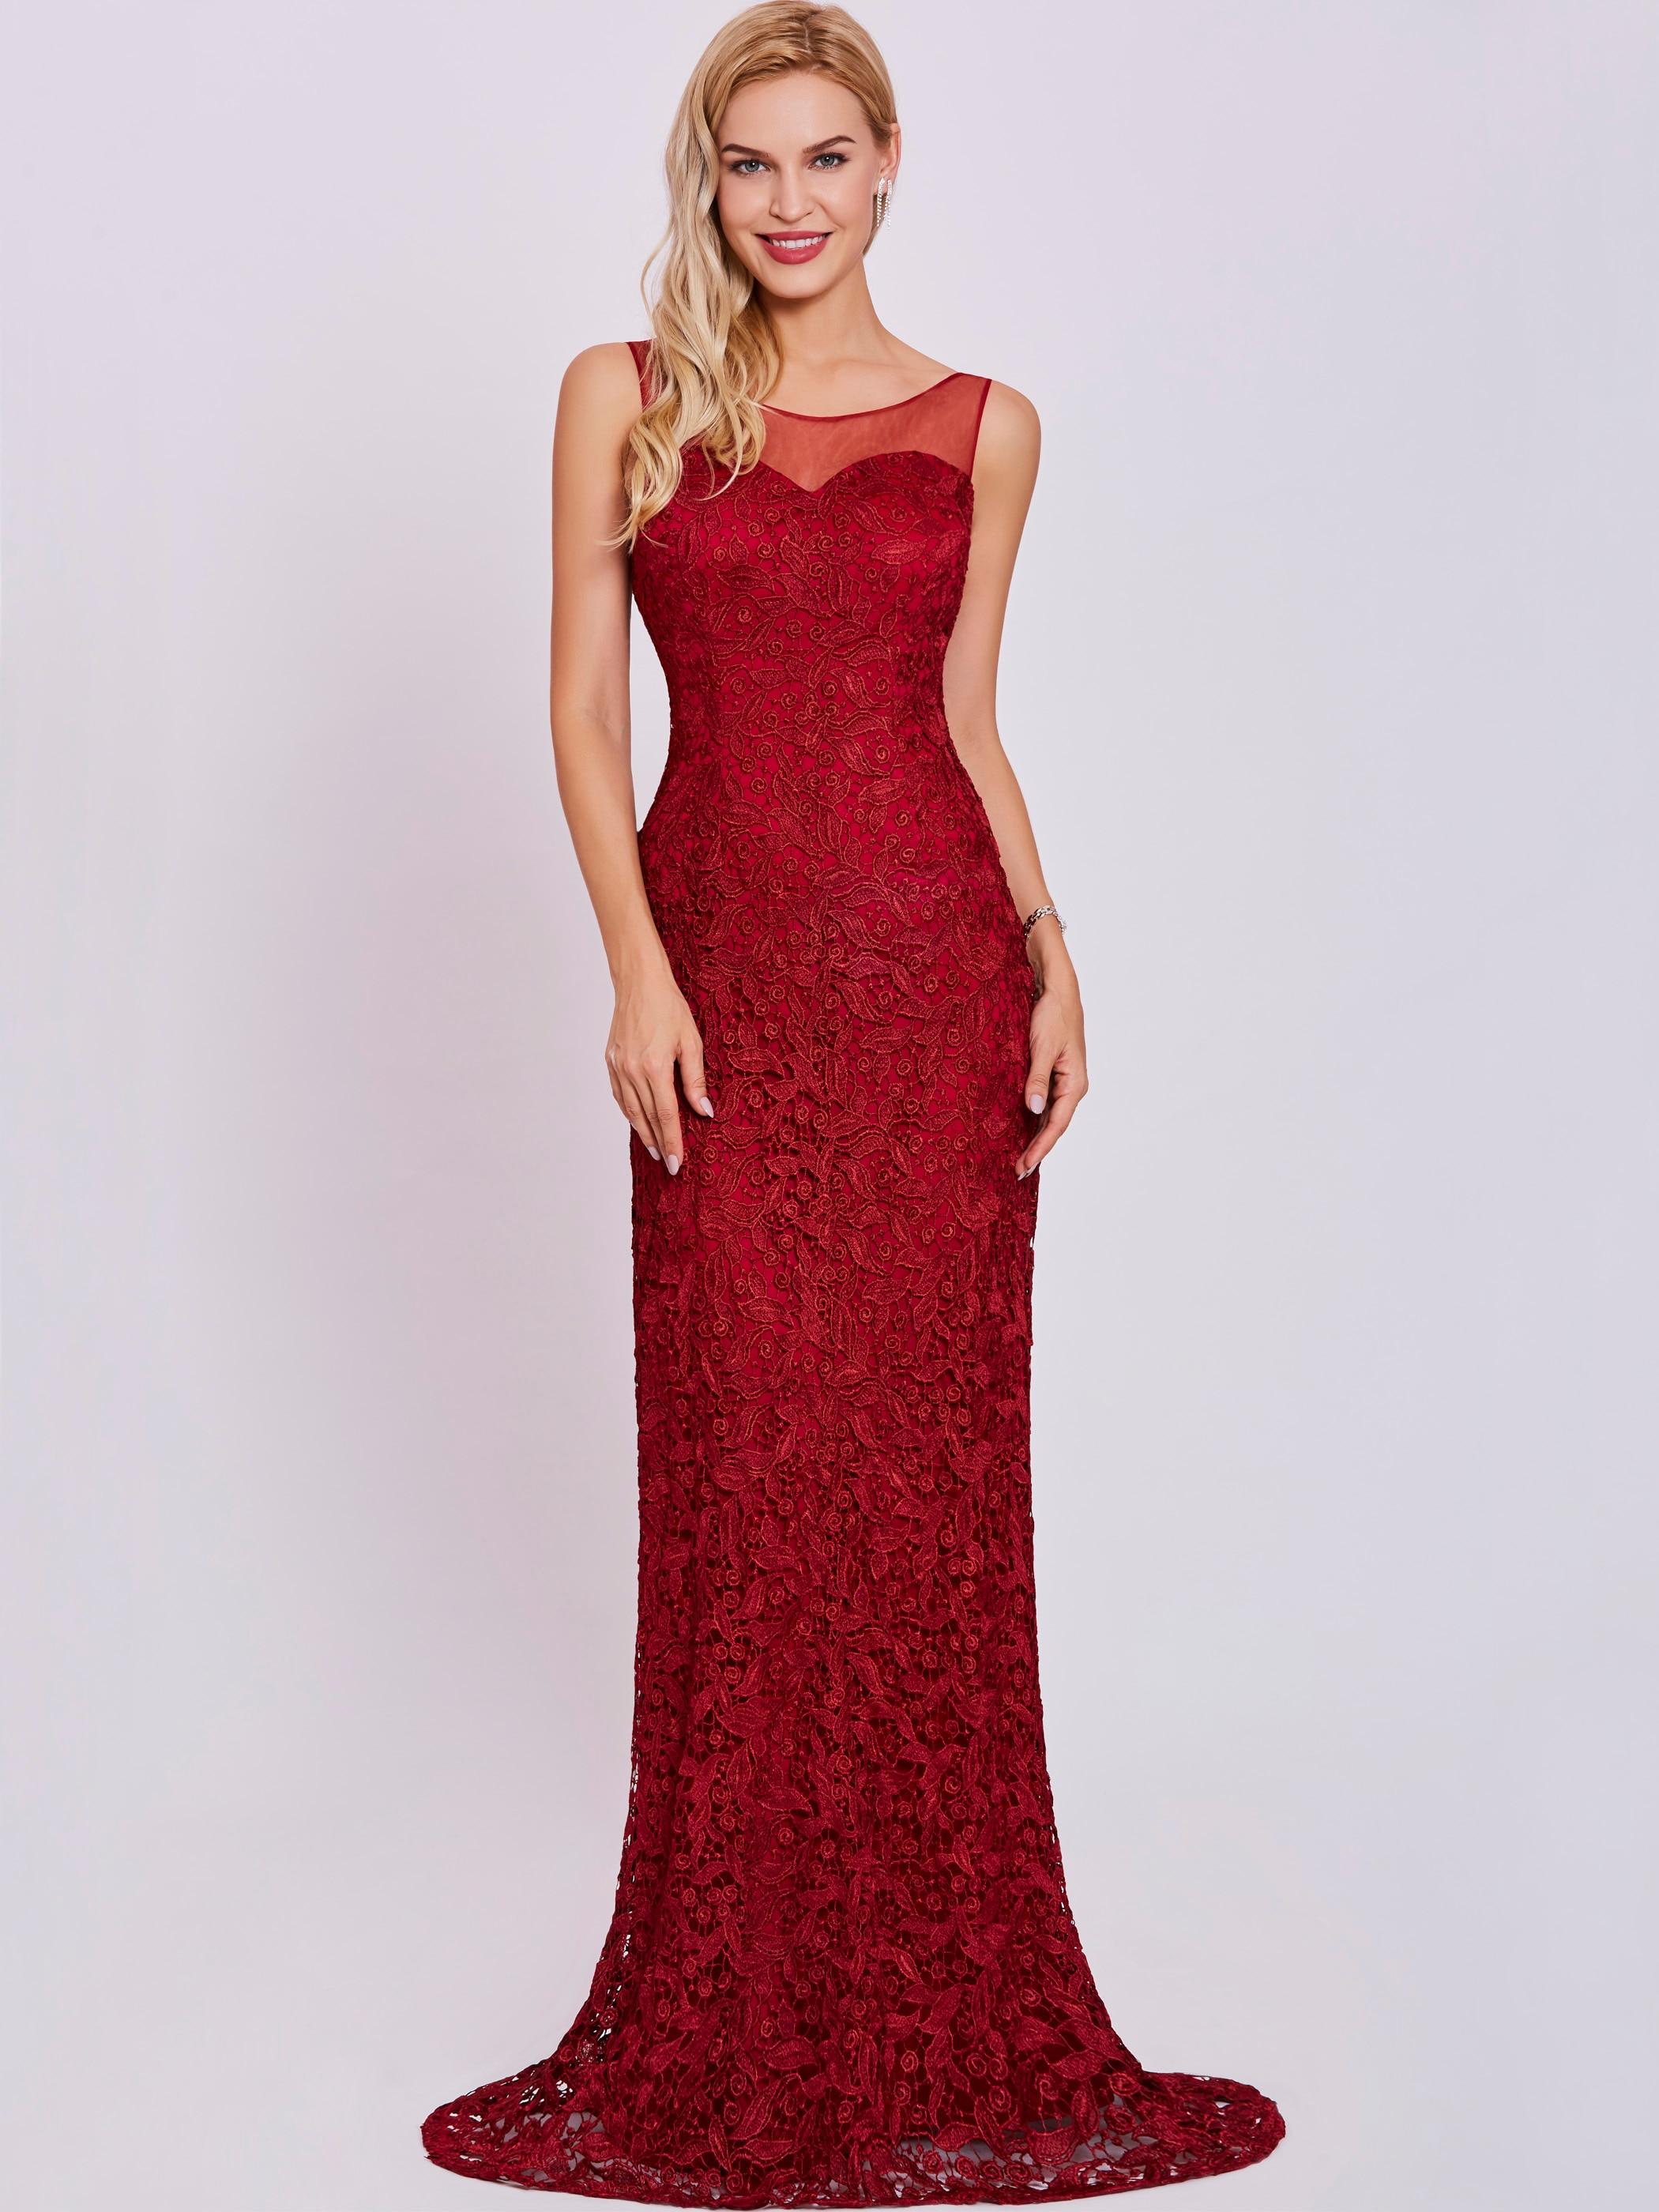 Dressv Scoop Neck Evening Dress Burgundy Sleeveless Sheath Floor Length Gown Women Lace Appliques Formal Long Evening Dresses